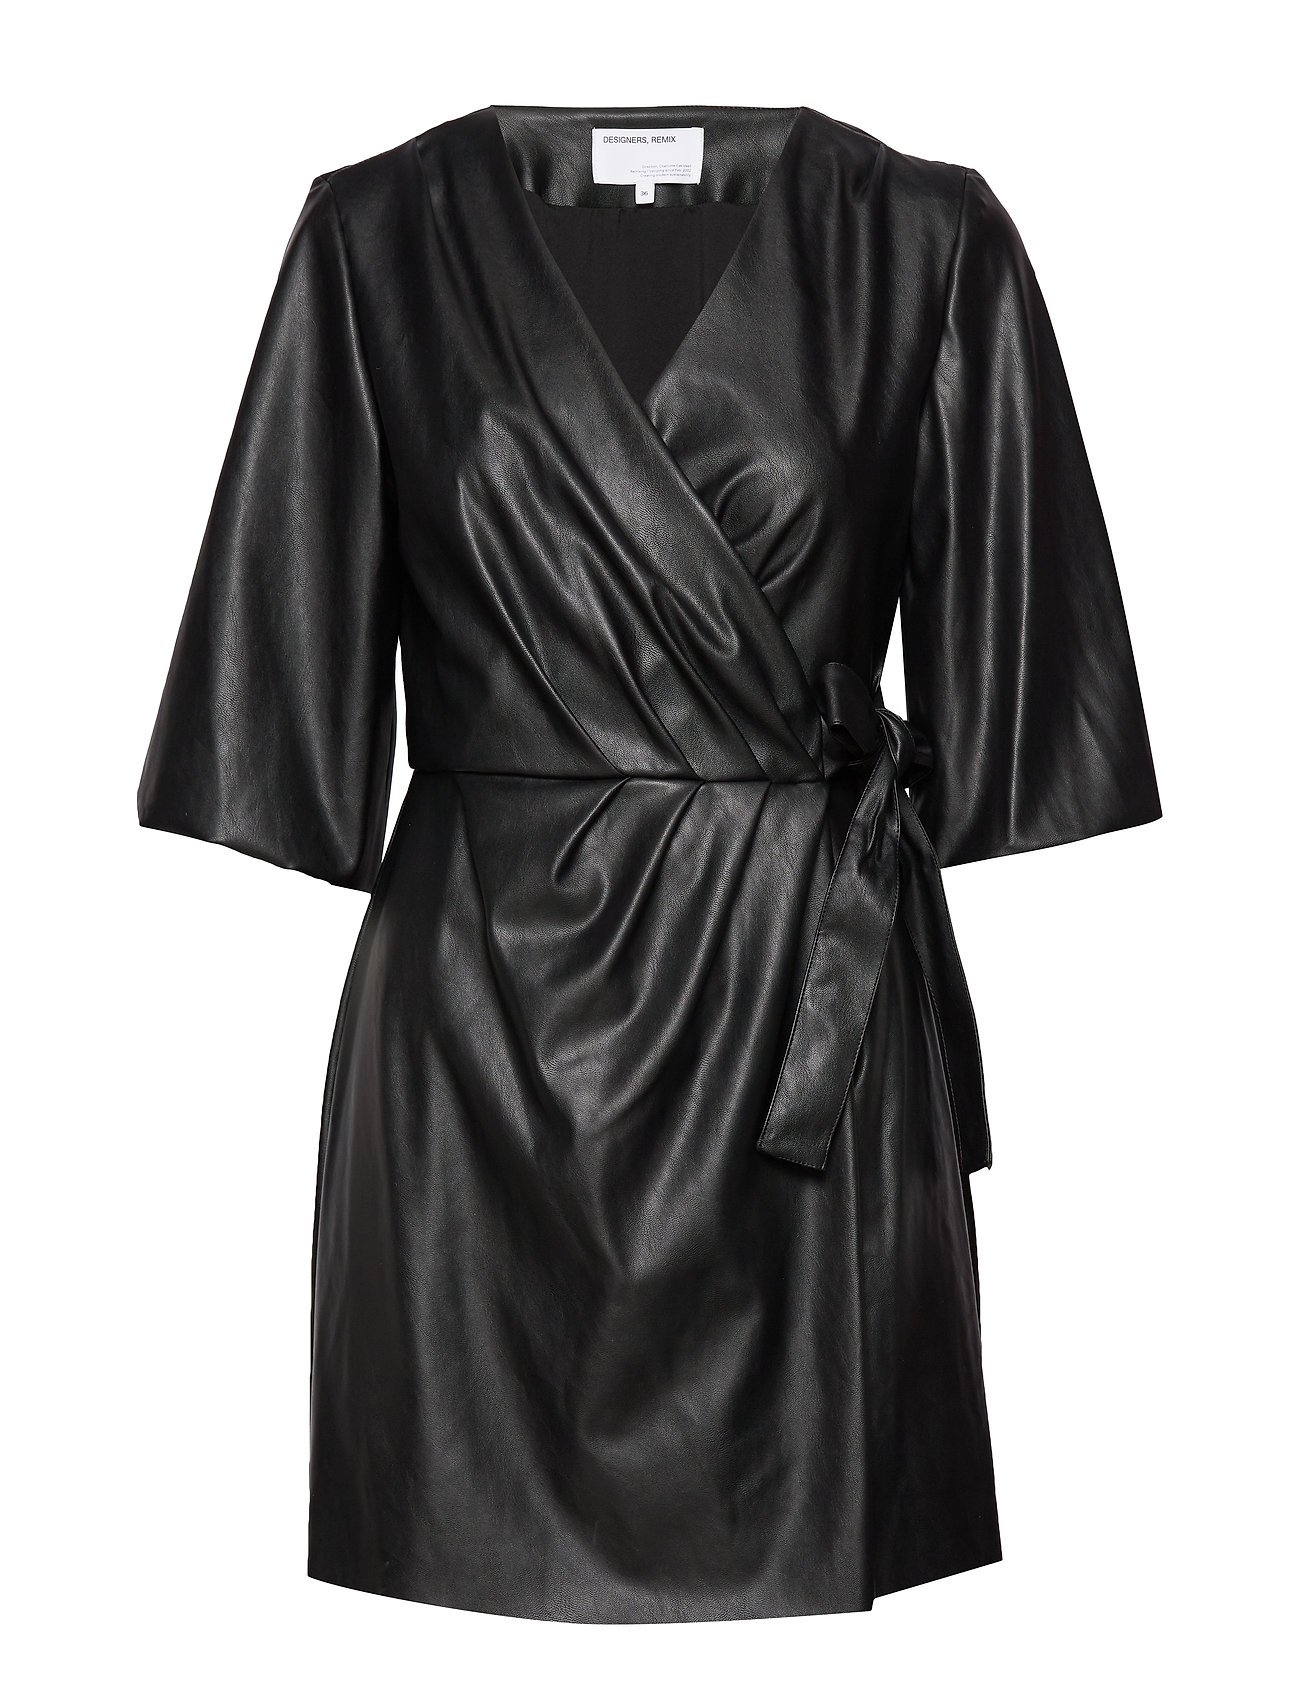 DESIGNERS, REMIX Tara Dress - BLACK